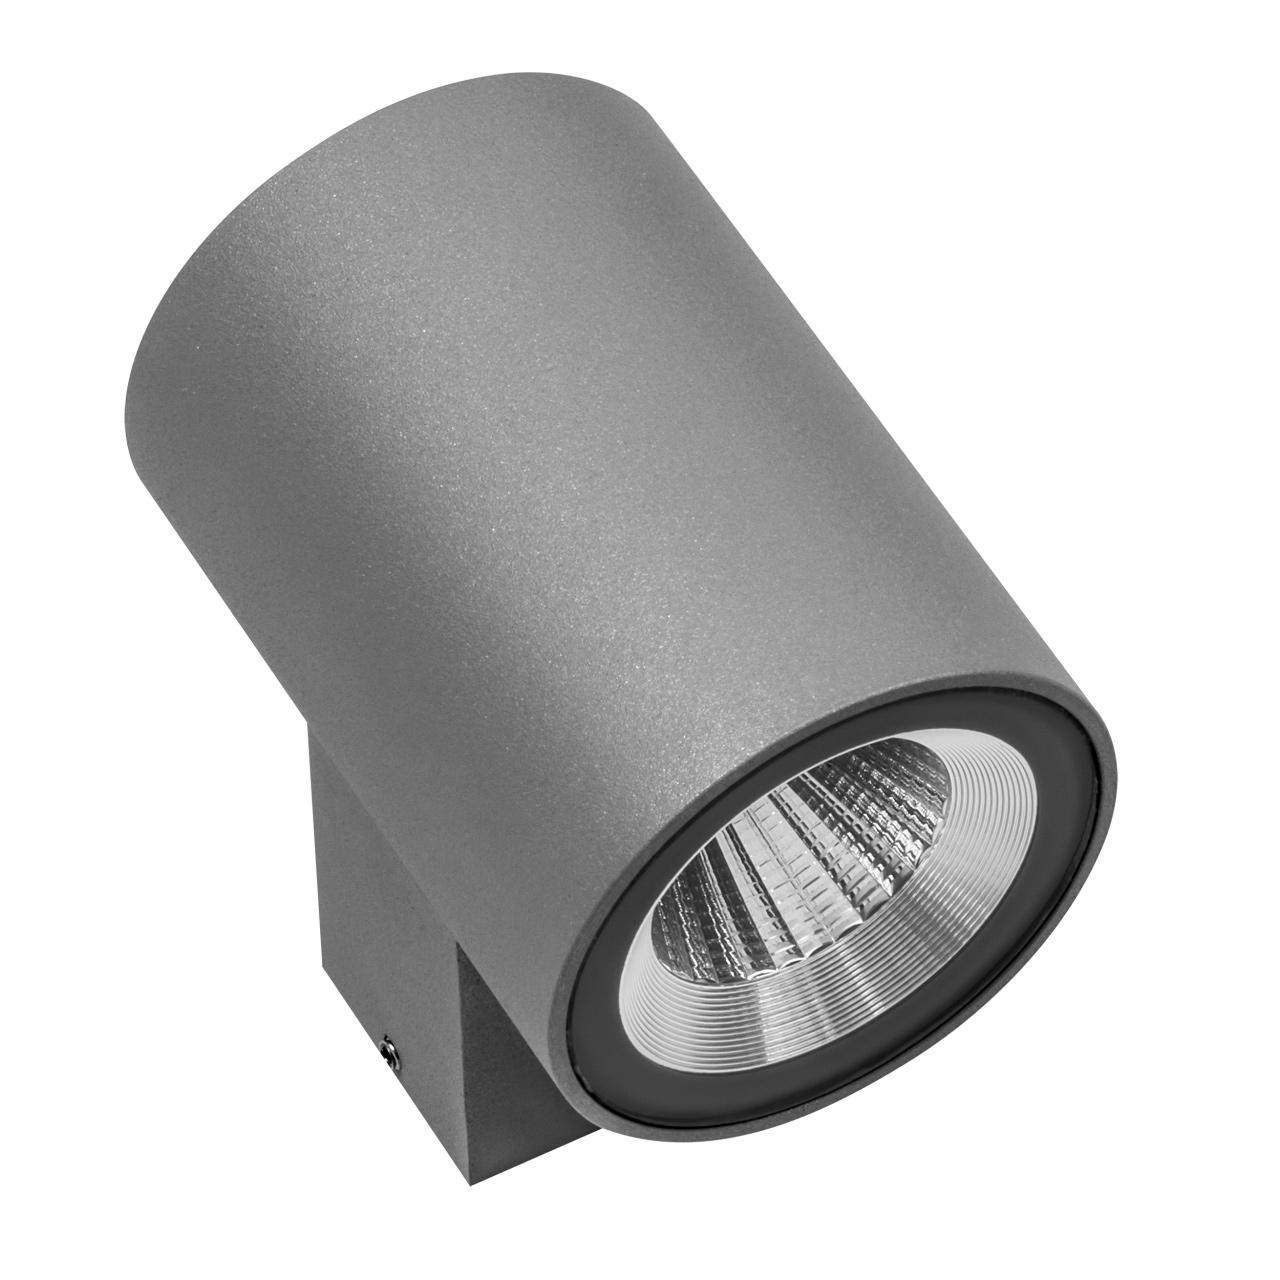 Светильник Paro LED 2*6W 960LM 24G серый 4000K IP65 Lightstar 351694